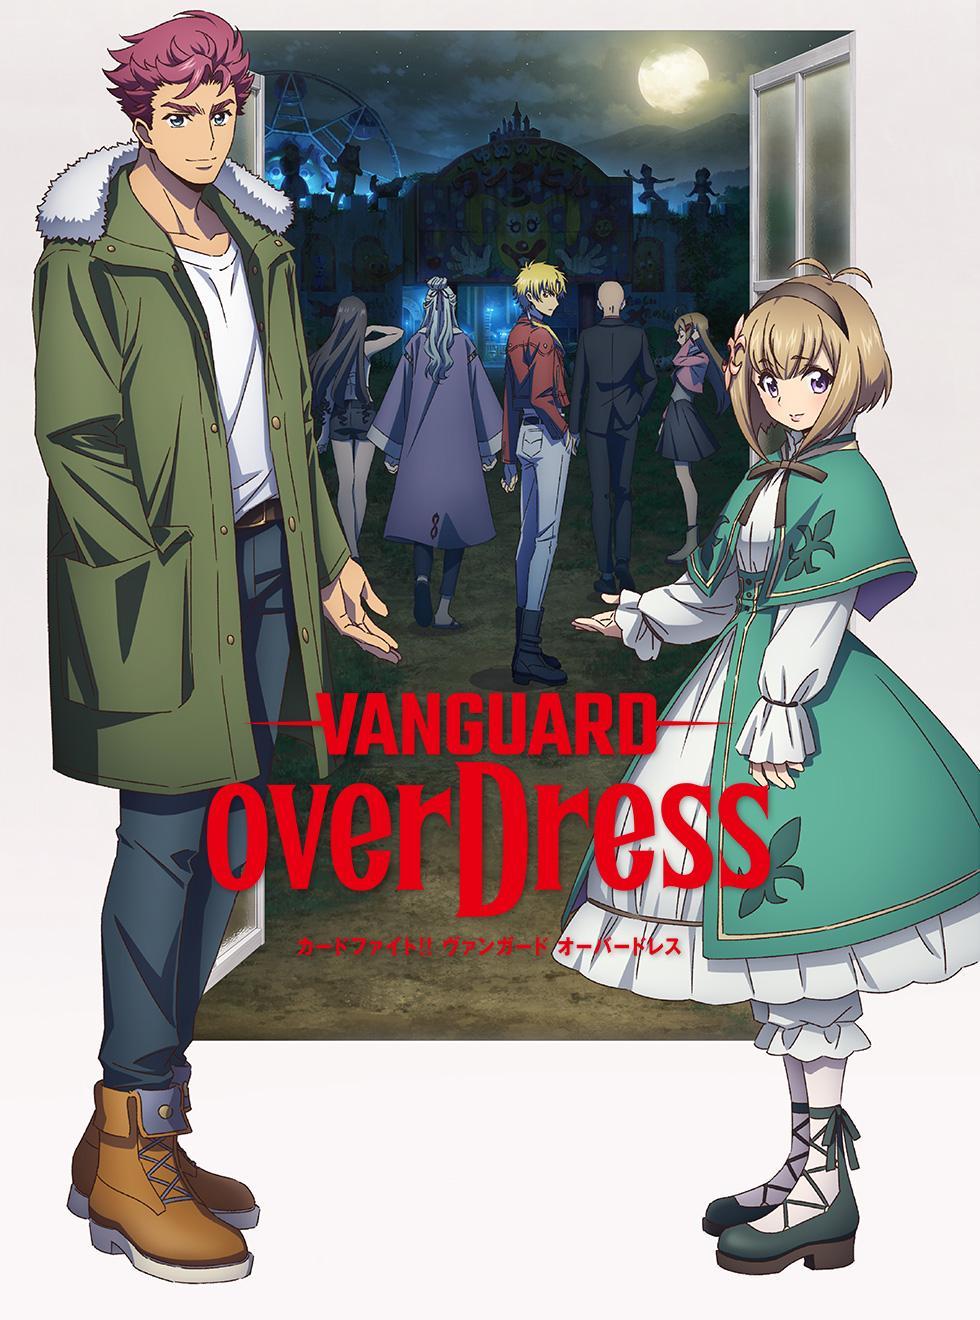 Cardfight!! Vanguard overDress ตอนที่ 1-11 ซับไทย (ยังไม่จบ)